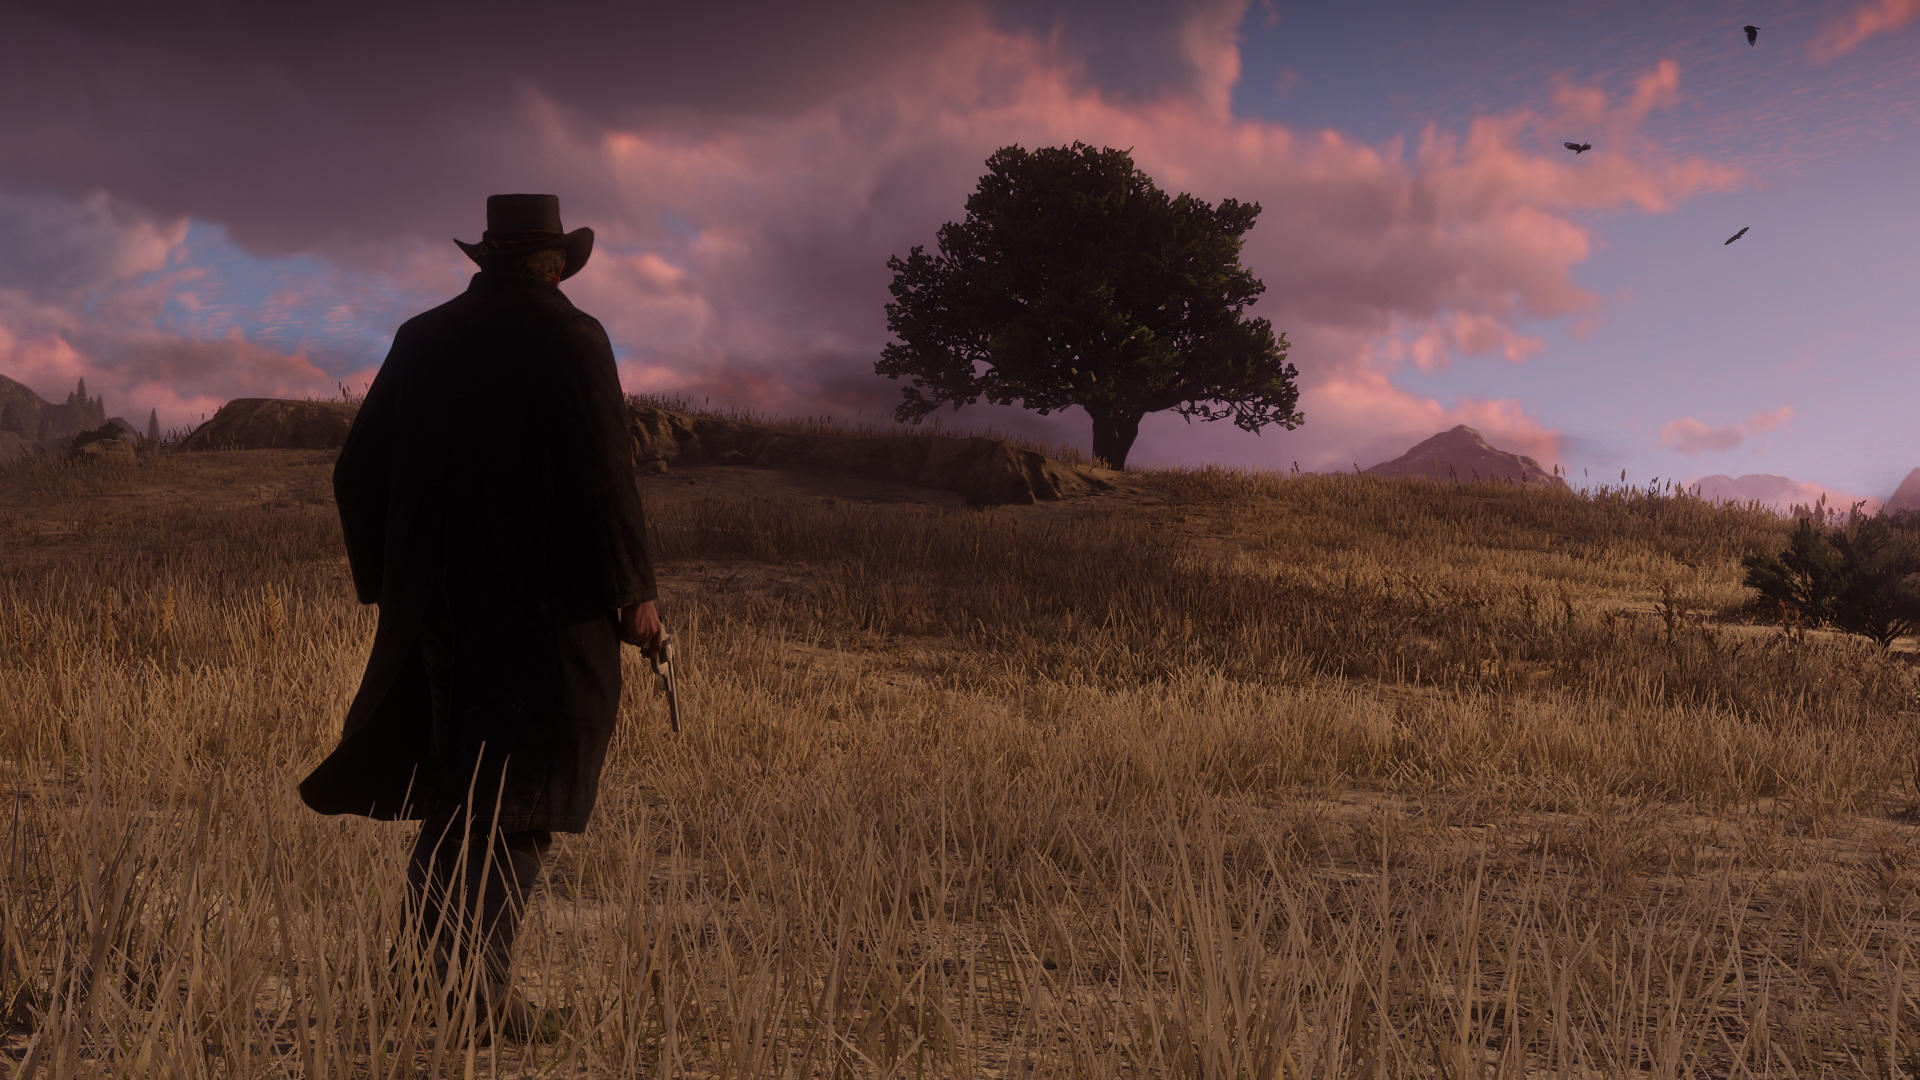 Free Download Red Dead Redemption 2 Wallpaper 1080p Flip